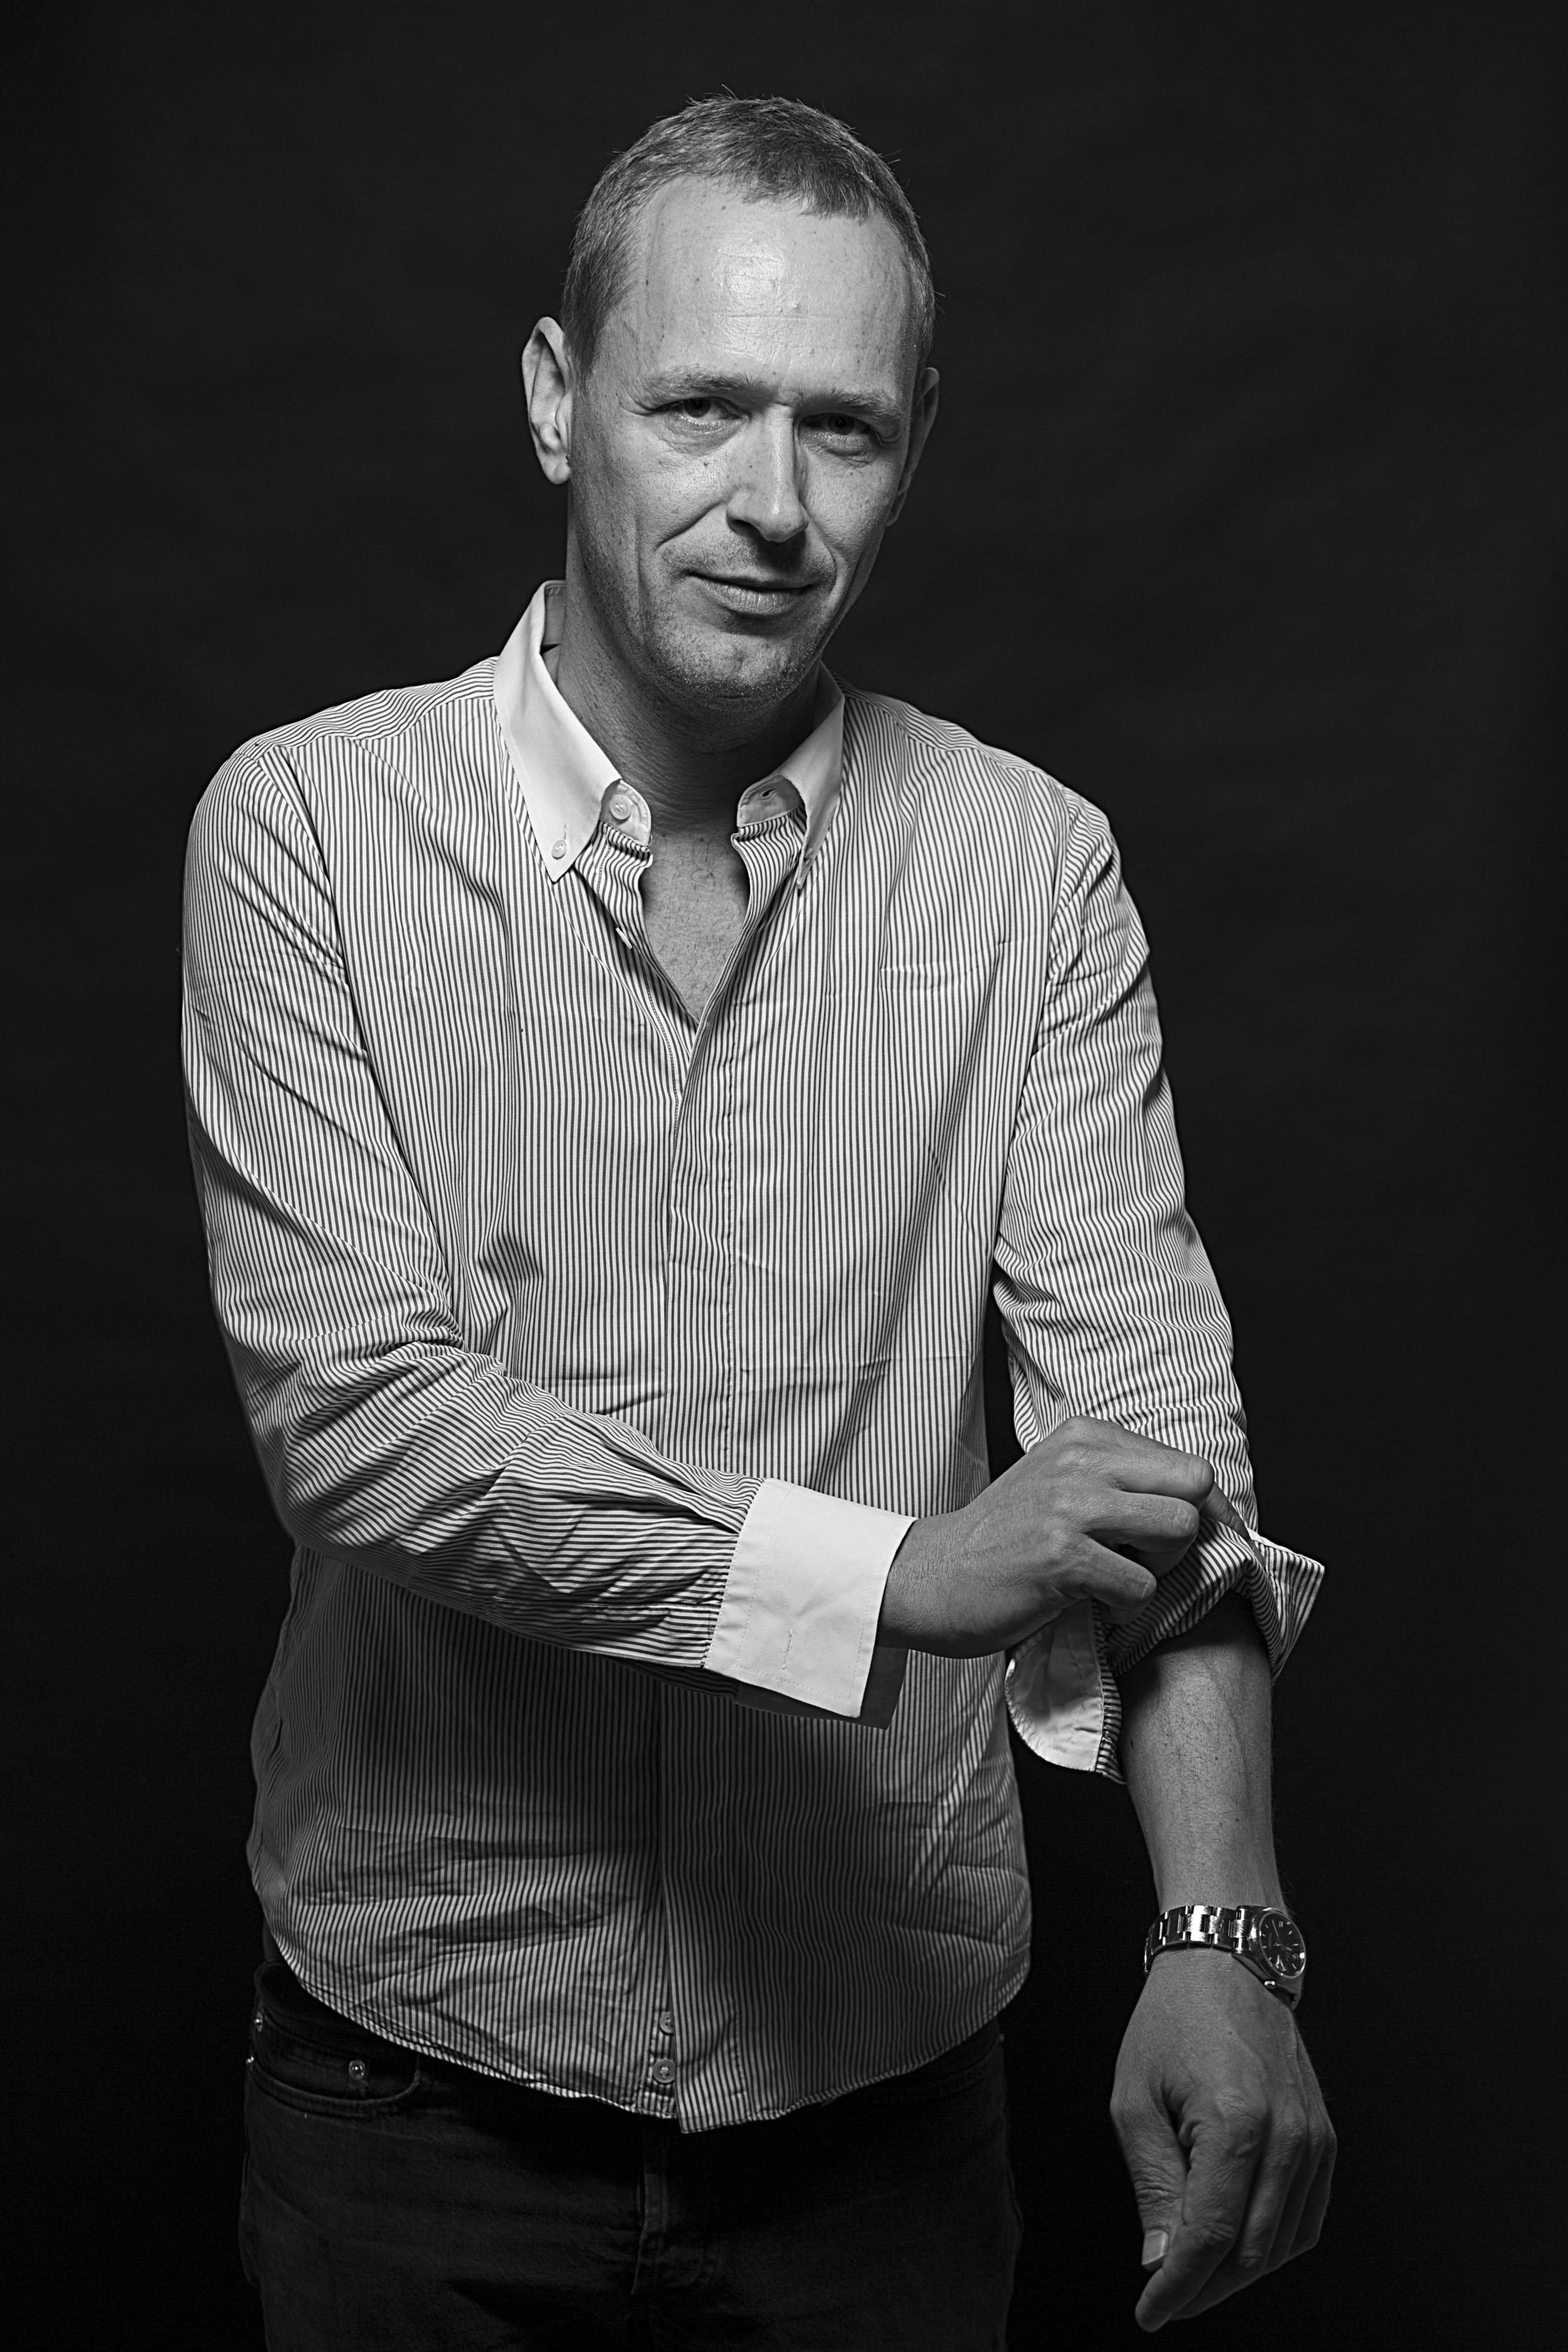 Christian Jankowski